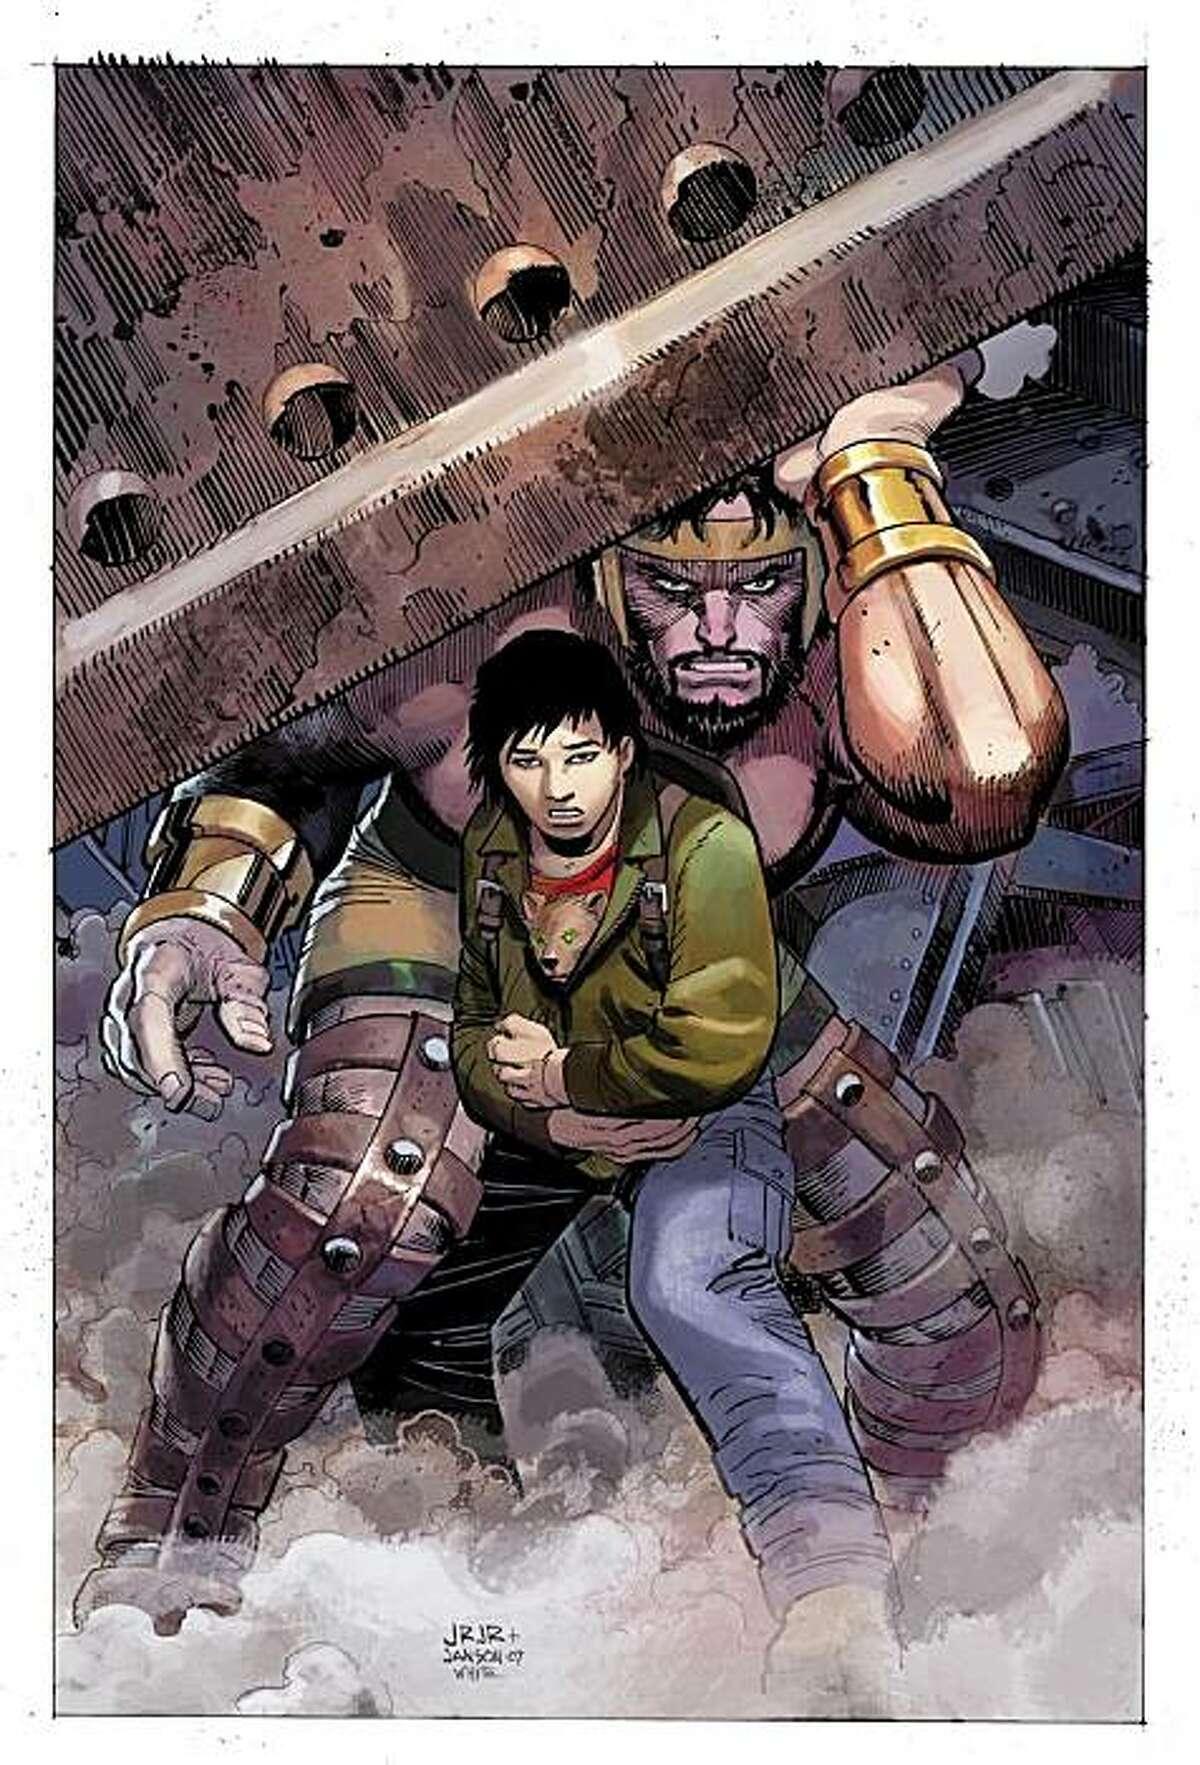 The Greek god Hercules and Amadeus Cho -- BFF!